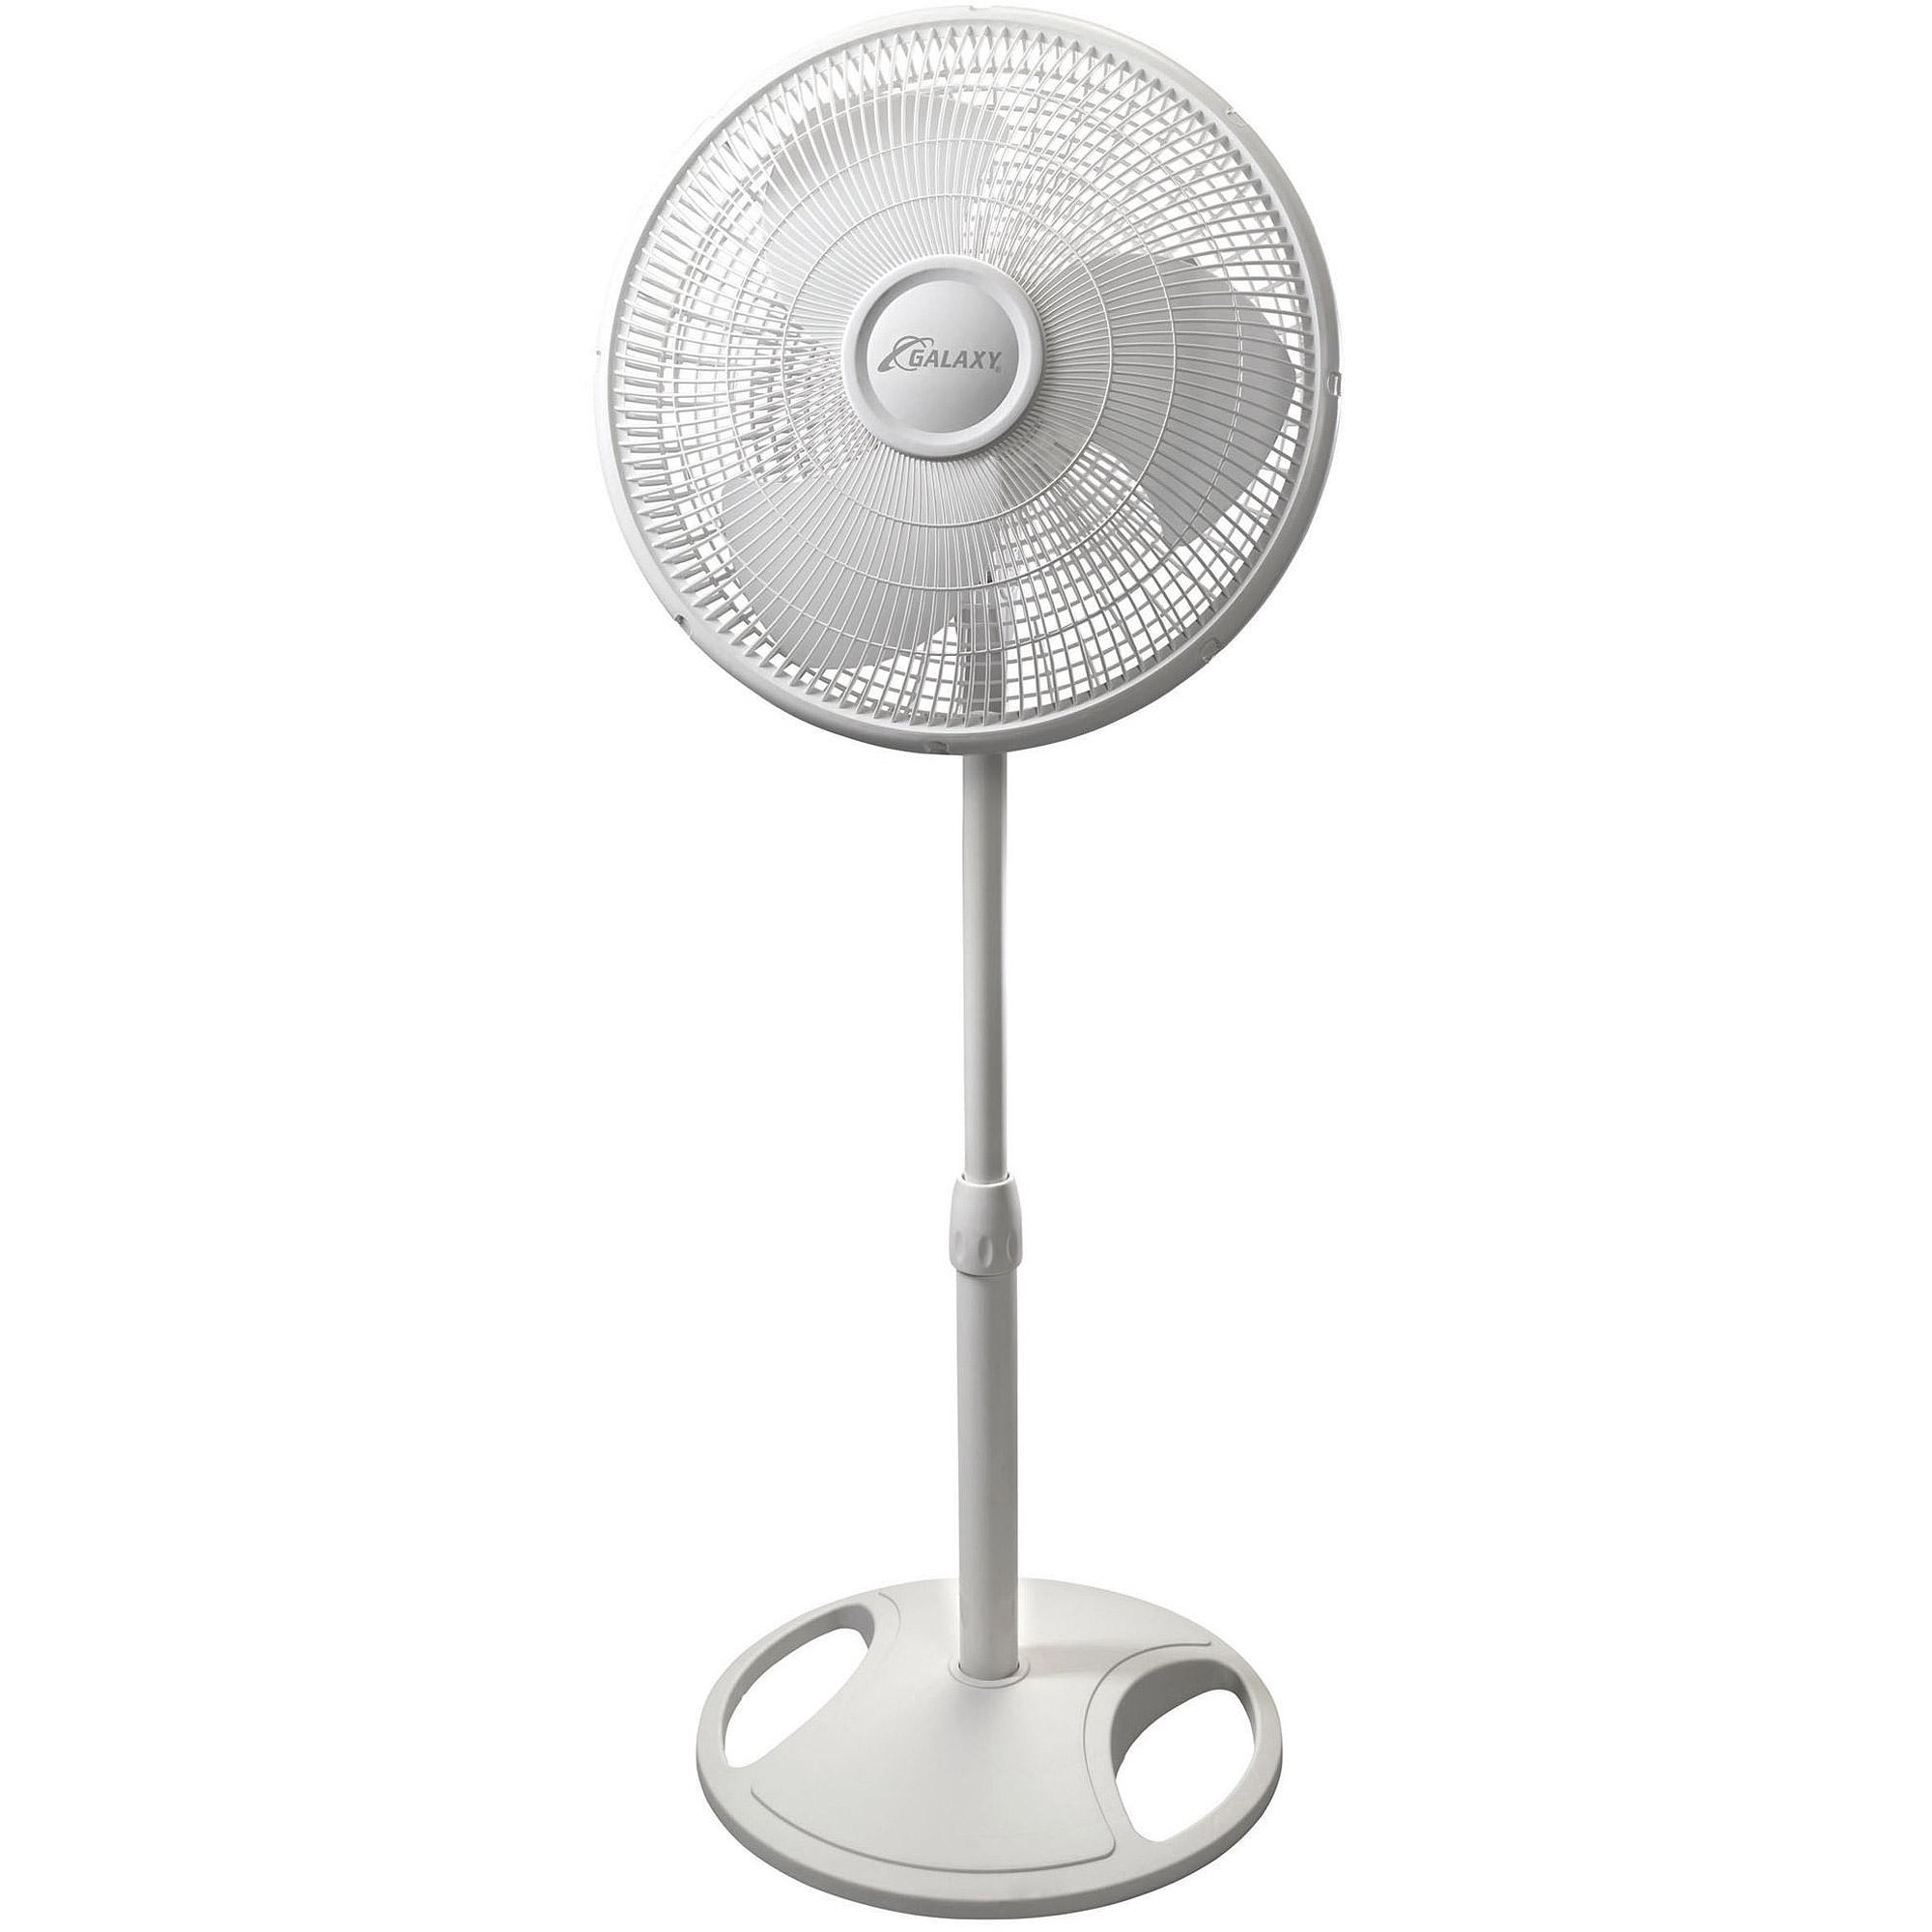 "Galaxy 16"" Oscillating Stand Fan"